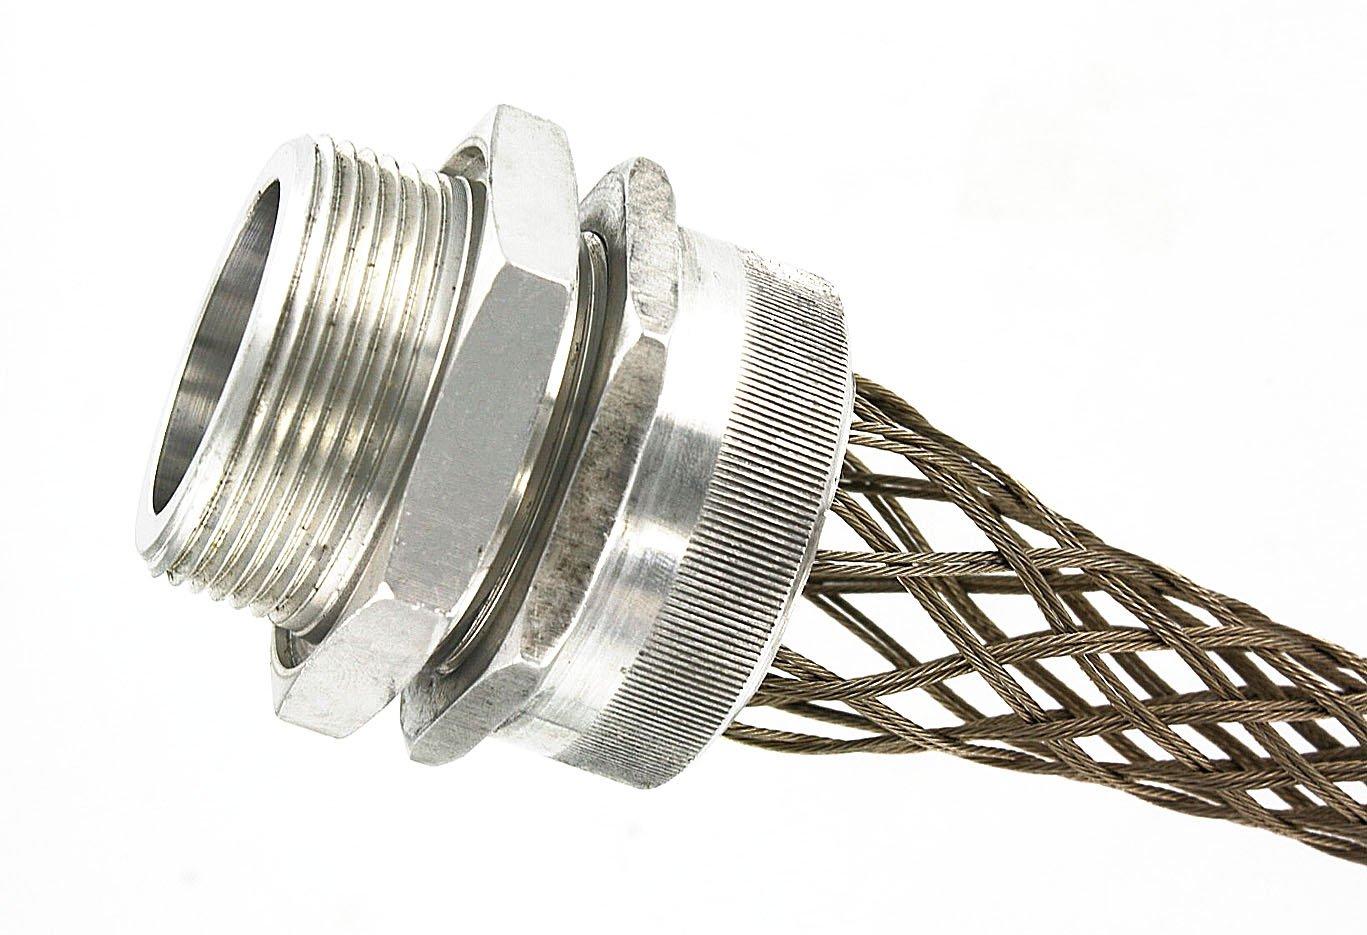 Leviton L7733 1-1/2-Inch, Straight, Male, Aluminum Body, Deluxe Cord Sealing Strain-Relief, 1.250, 1.375 Cord Range by Leviton